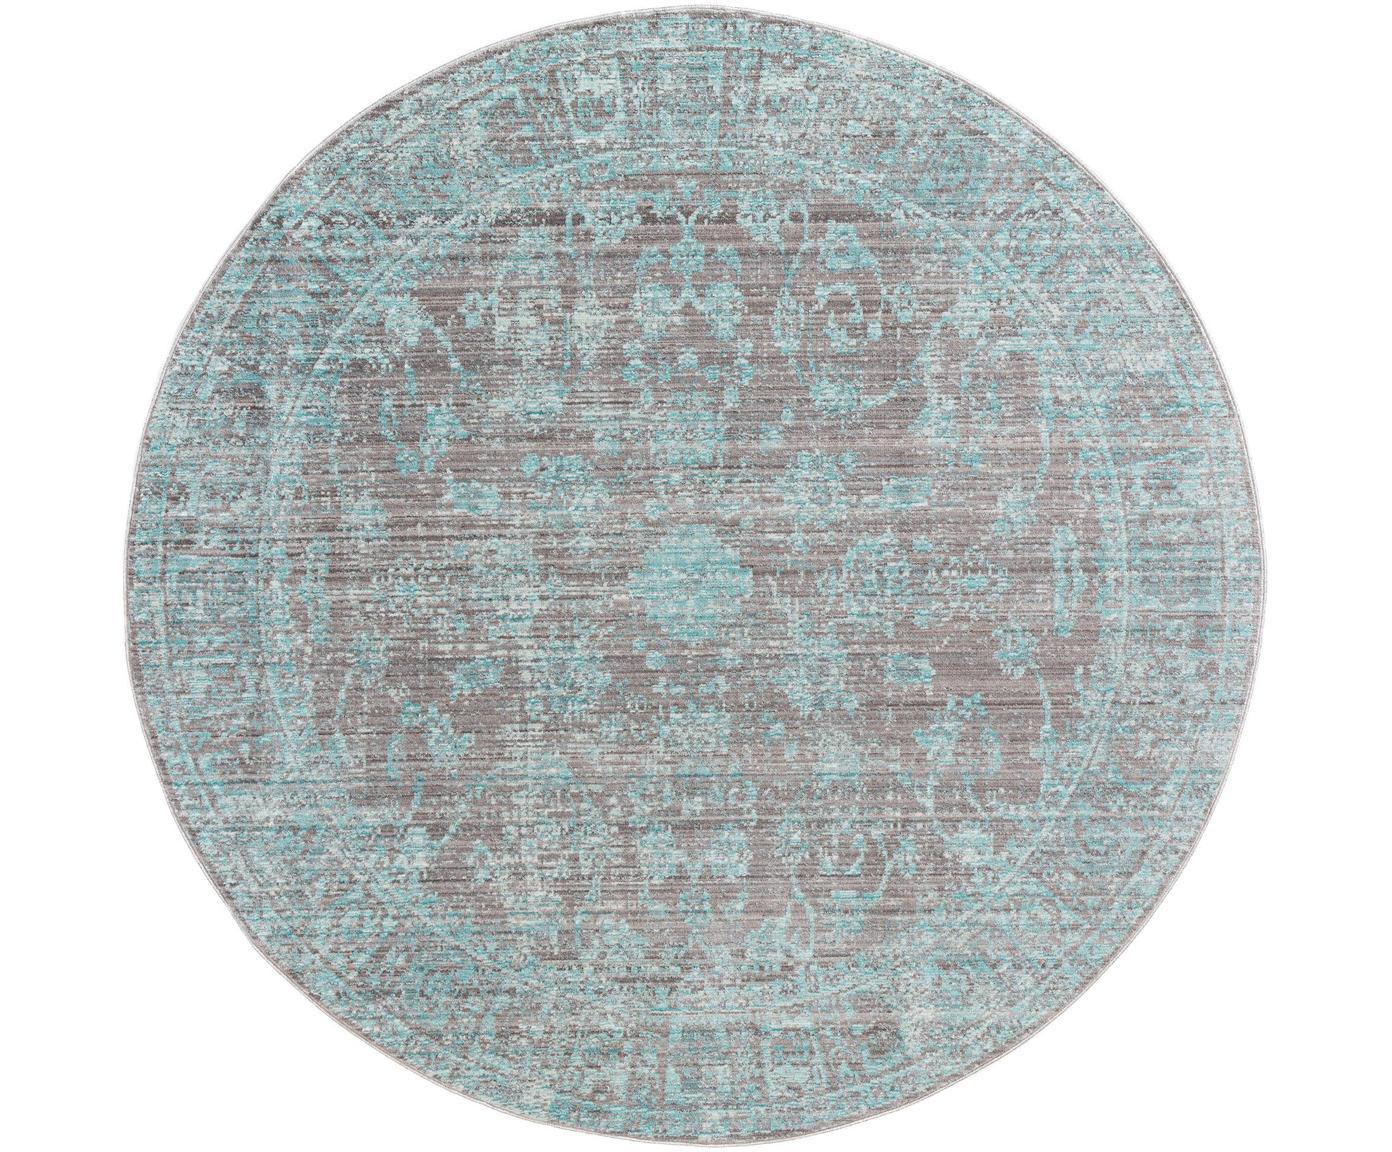 Alfombra redonda Visconti, estilo vintage, Parte superior: poliéster, Reverso: algodón, Turquesa, gris, Ø 180 cm